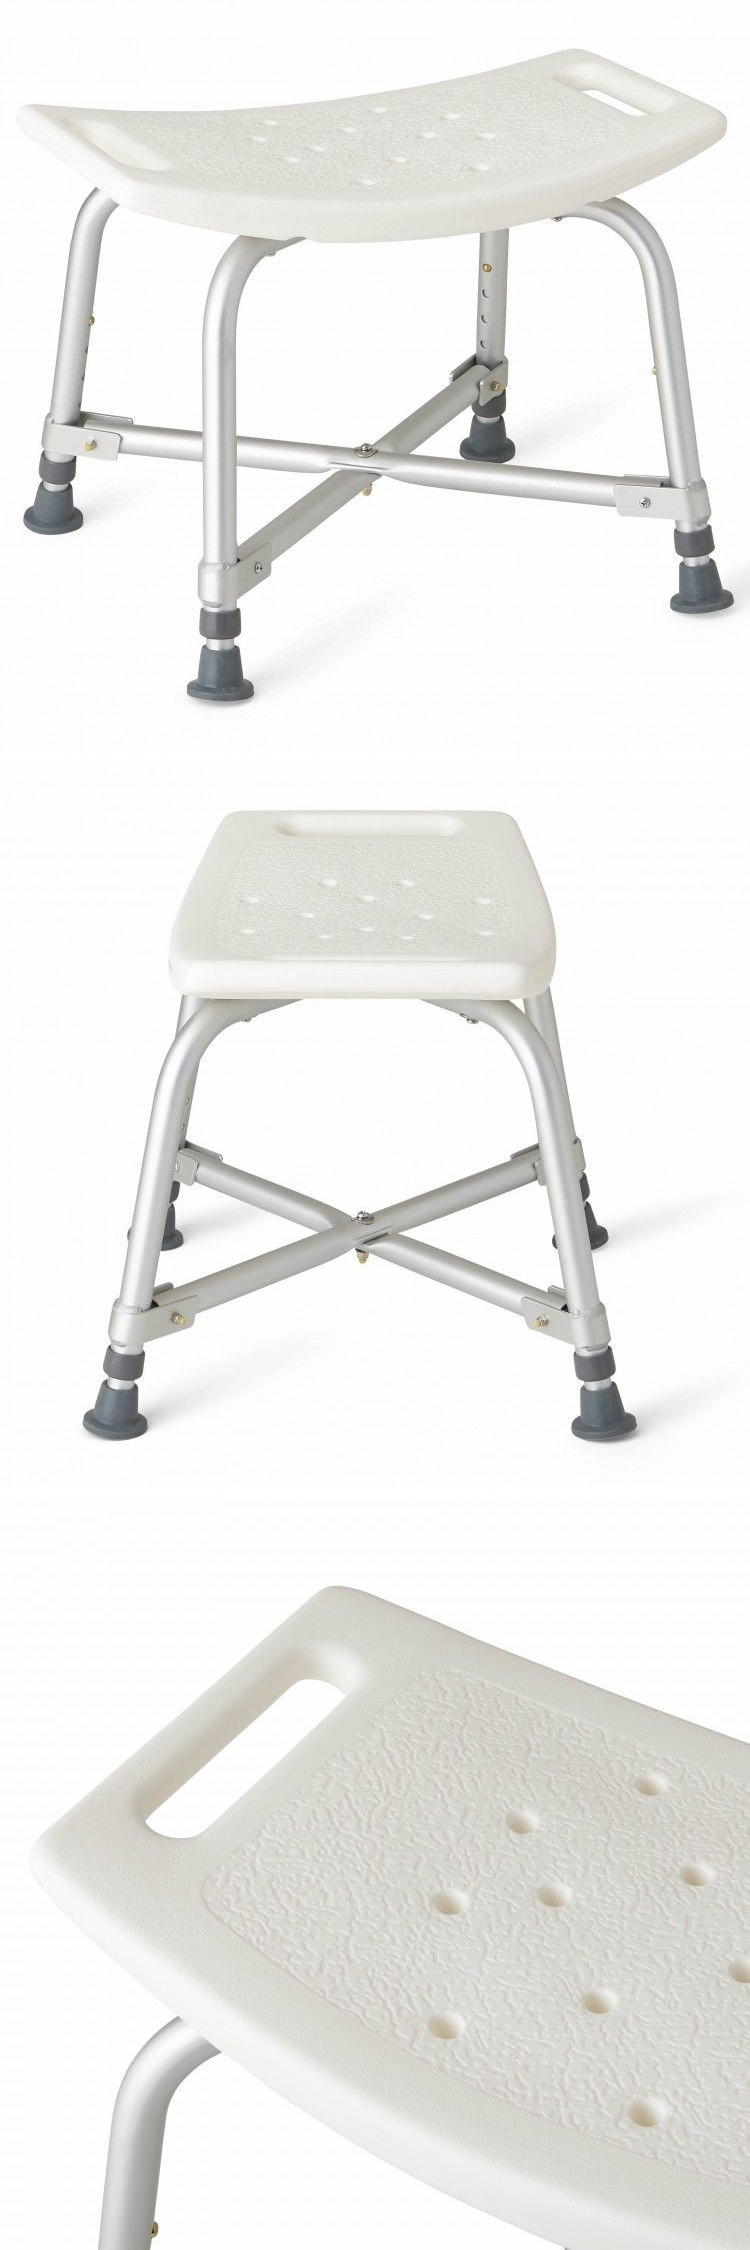 Shower and Bath Seats: Bariatric Bath Bench Heavy Duty Chair Tub ...